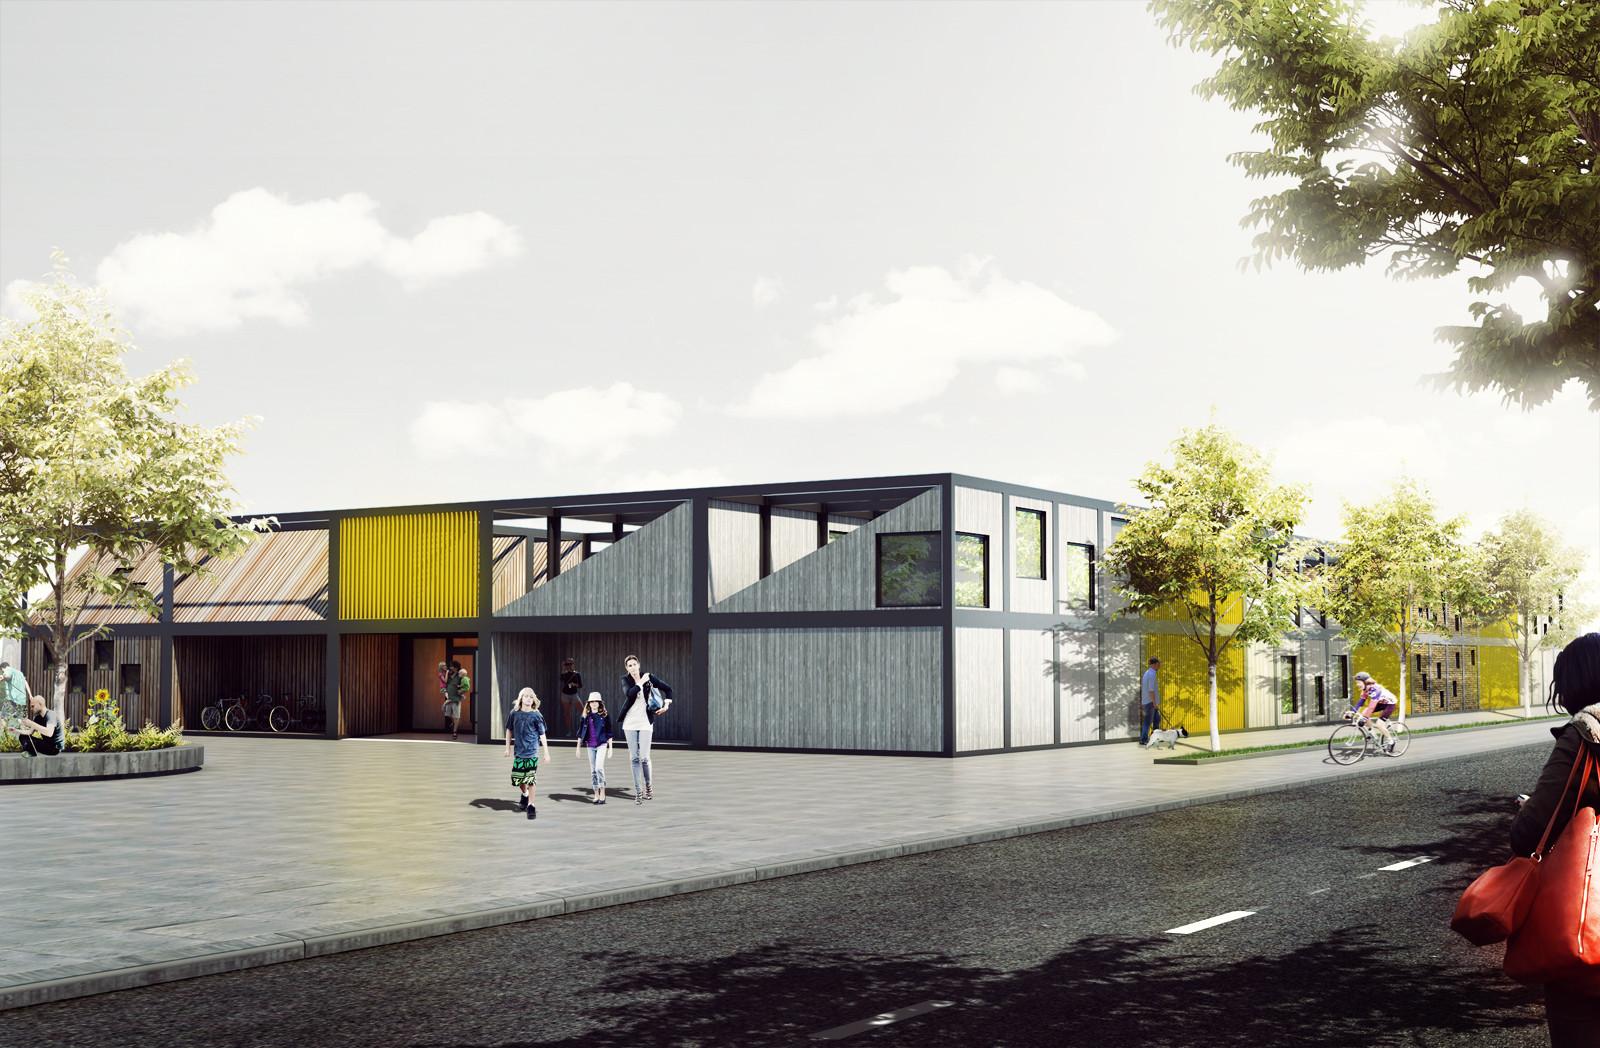 Kinder Garden: Modular Kindergarten Proposal / Adam